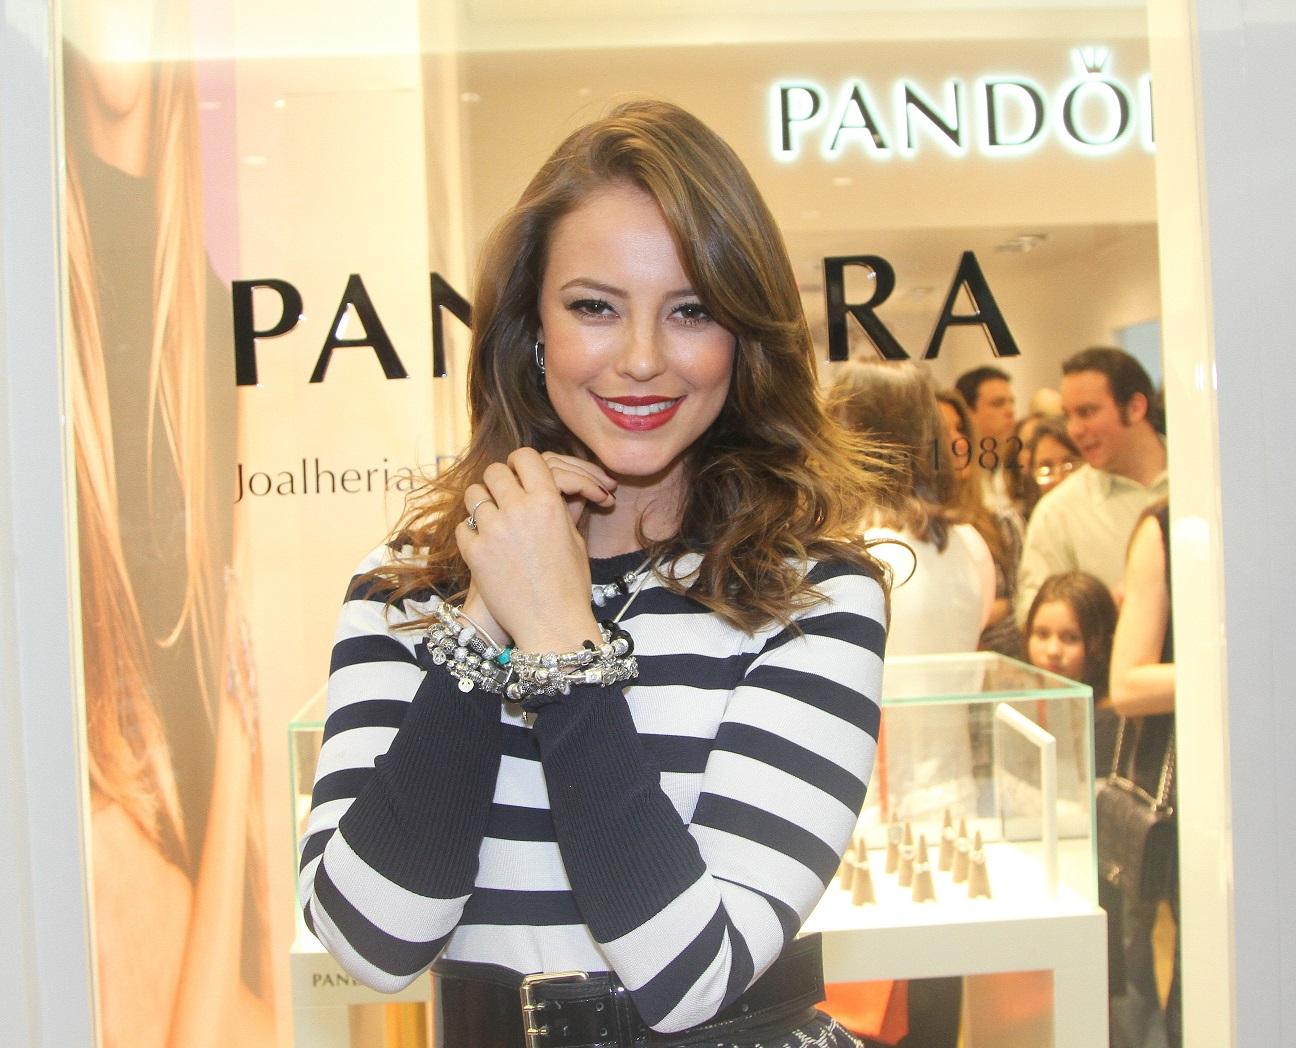 Pandora_1.JPG